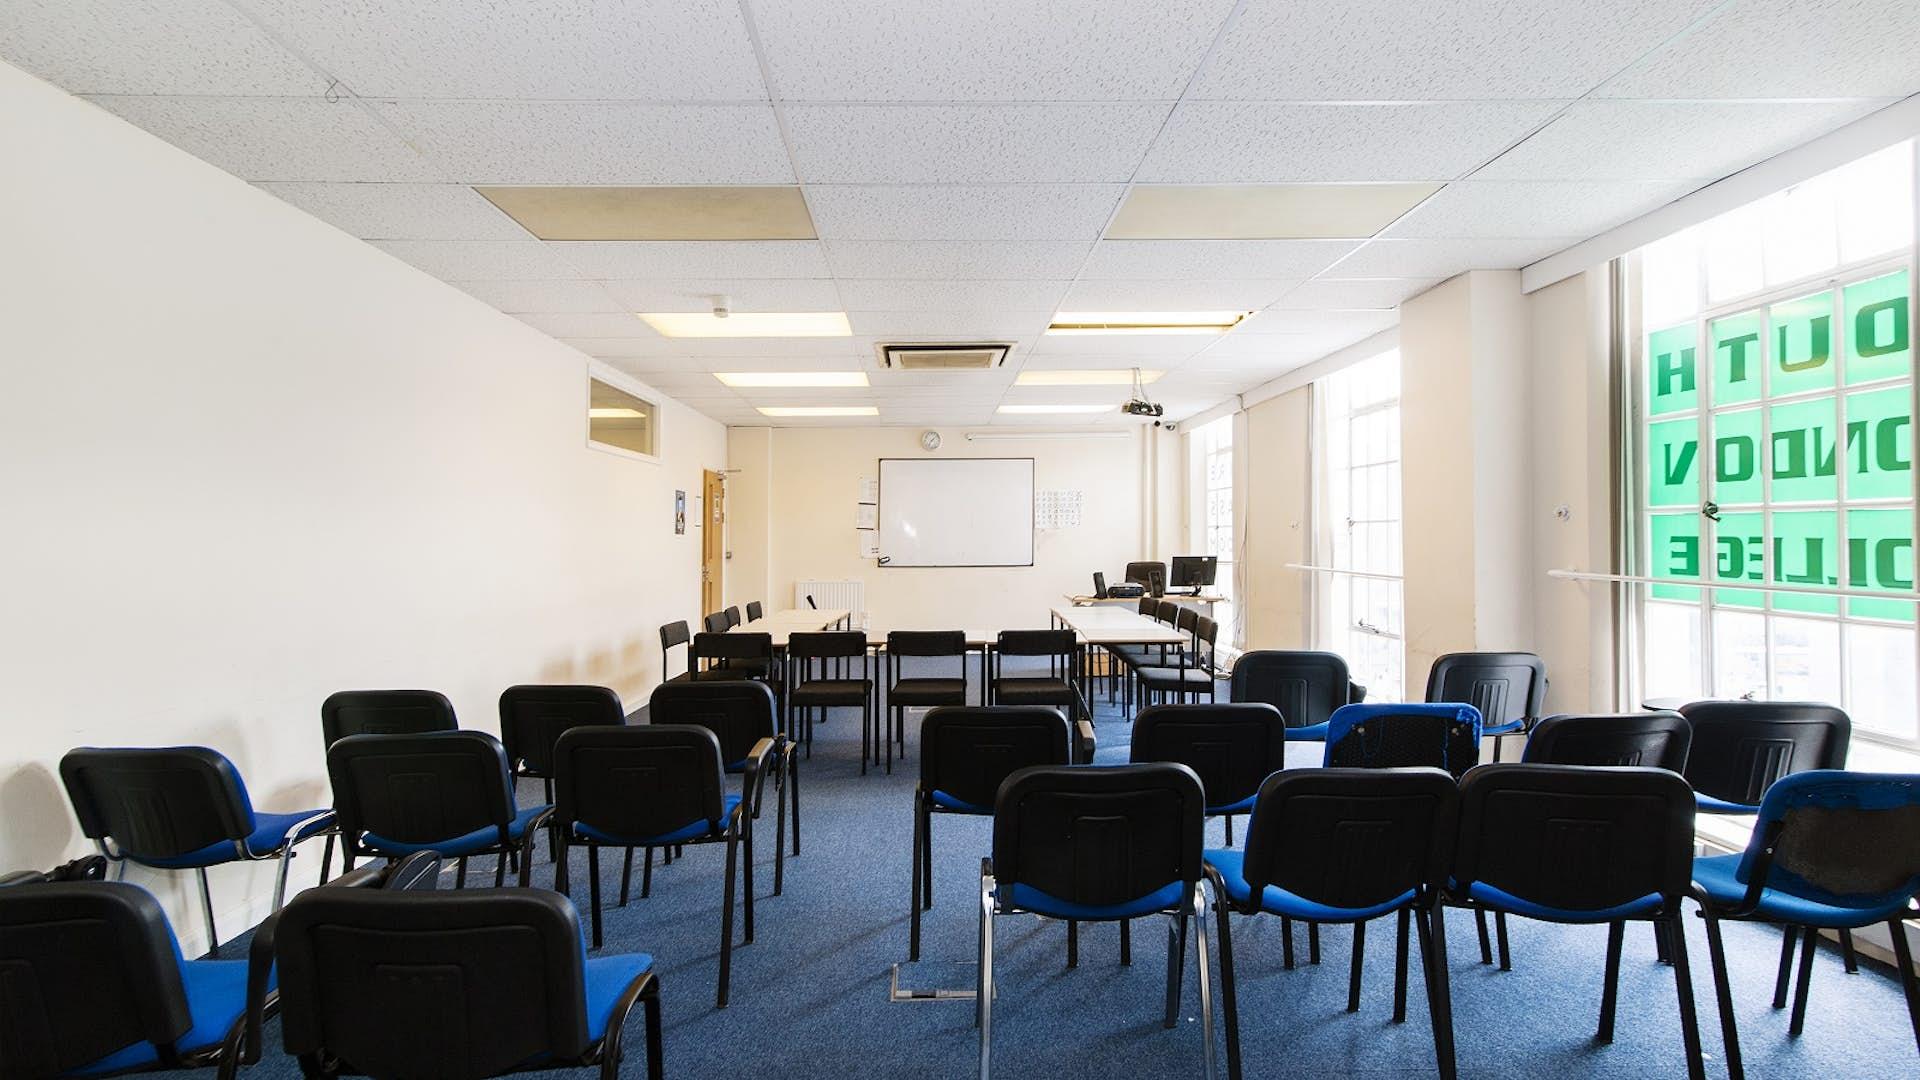 Meeting Room Hire Woolwich